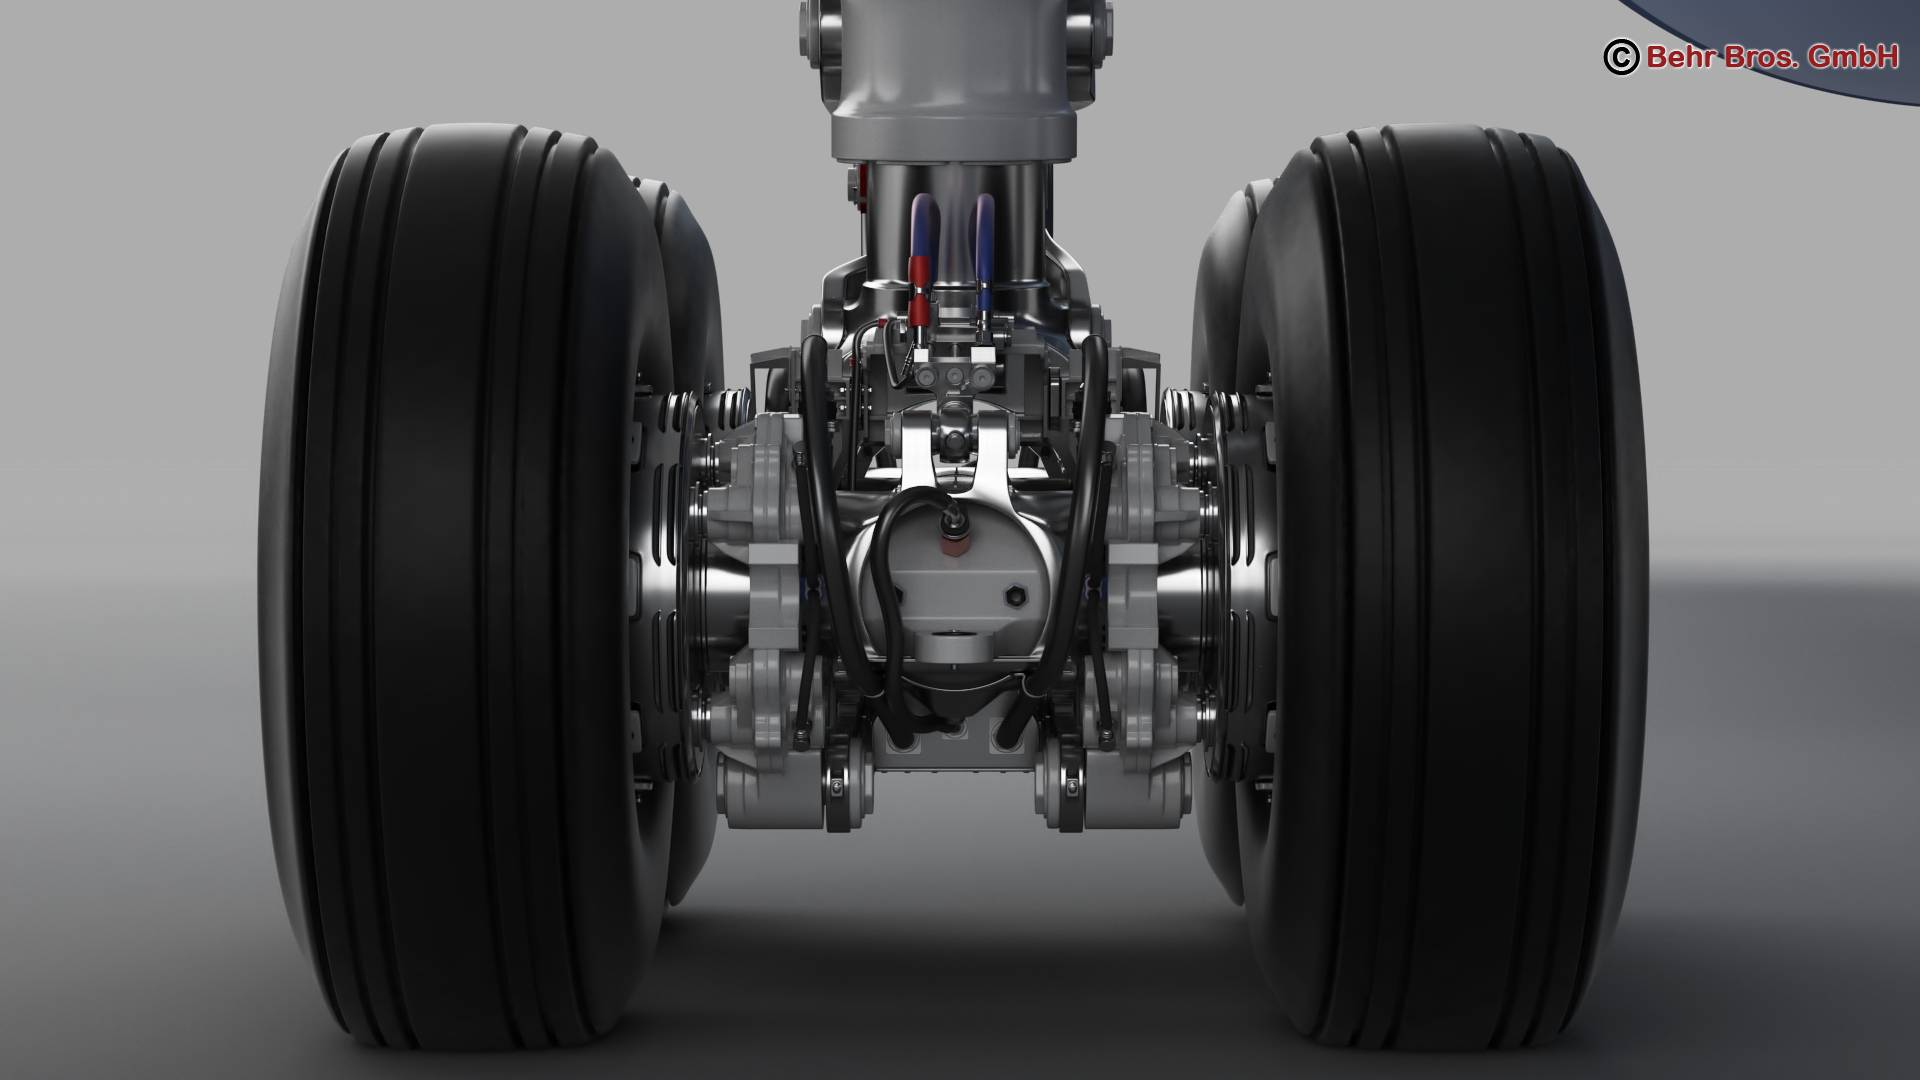 boeing 787-8 3d model 3ds max fbx c4d lwo ma mb obj 251351